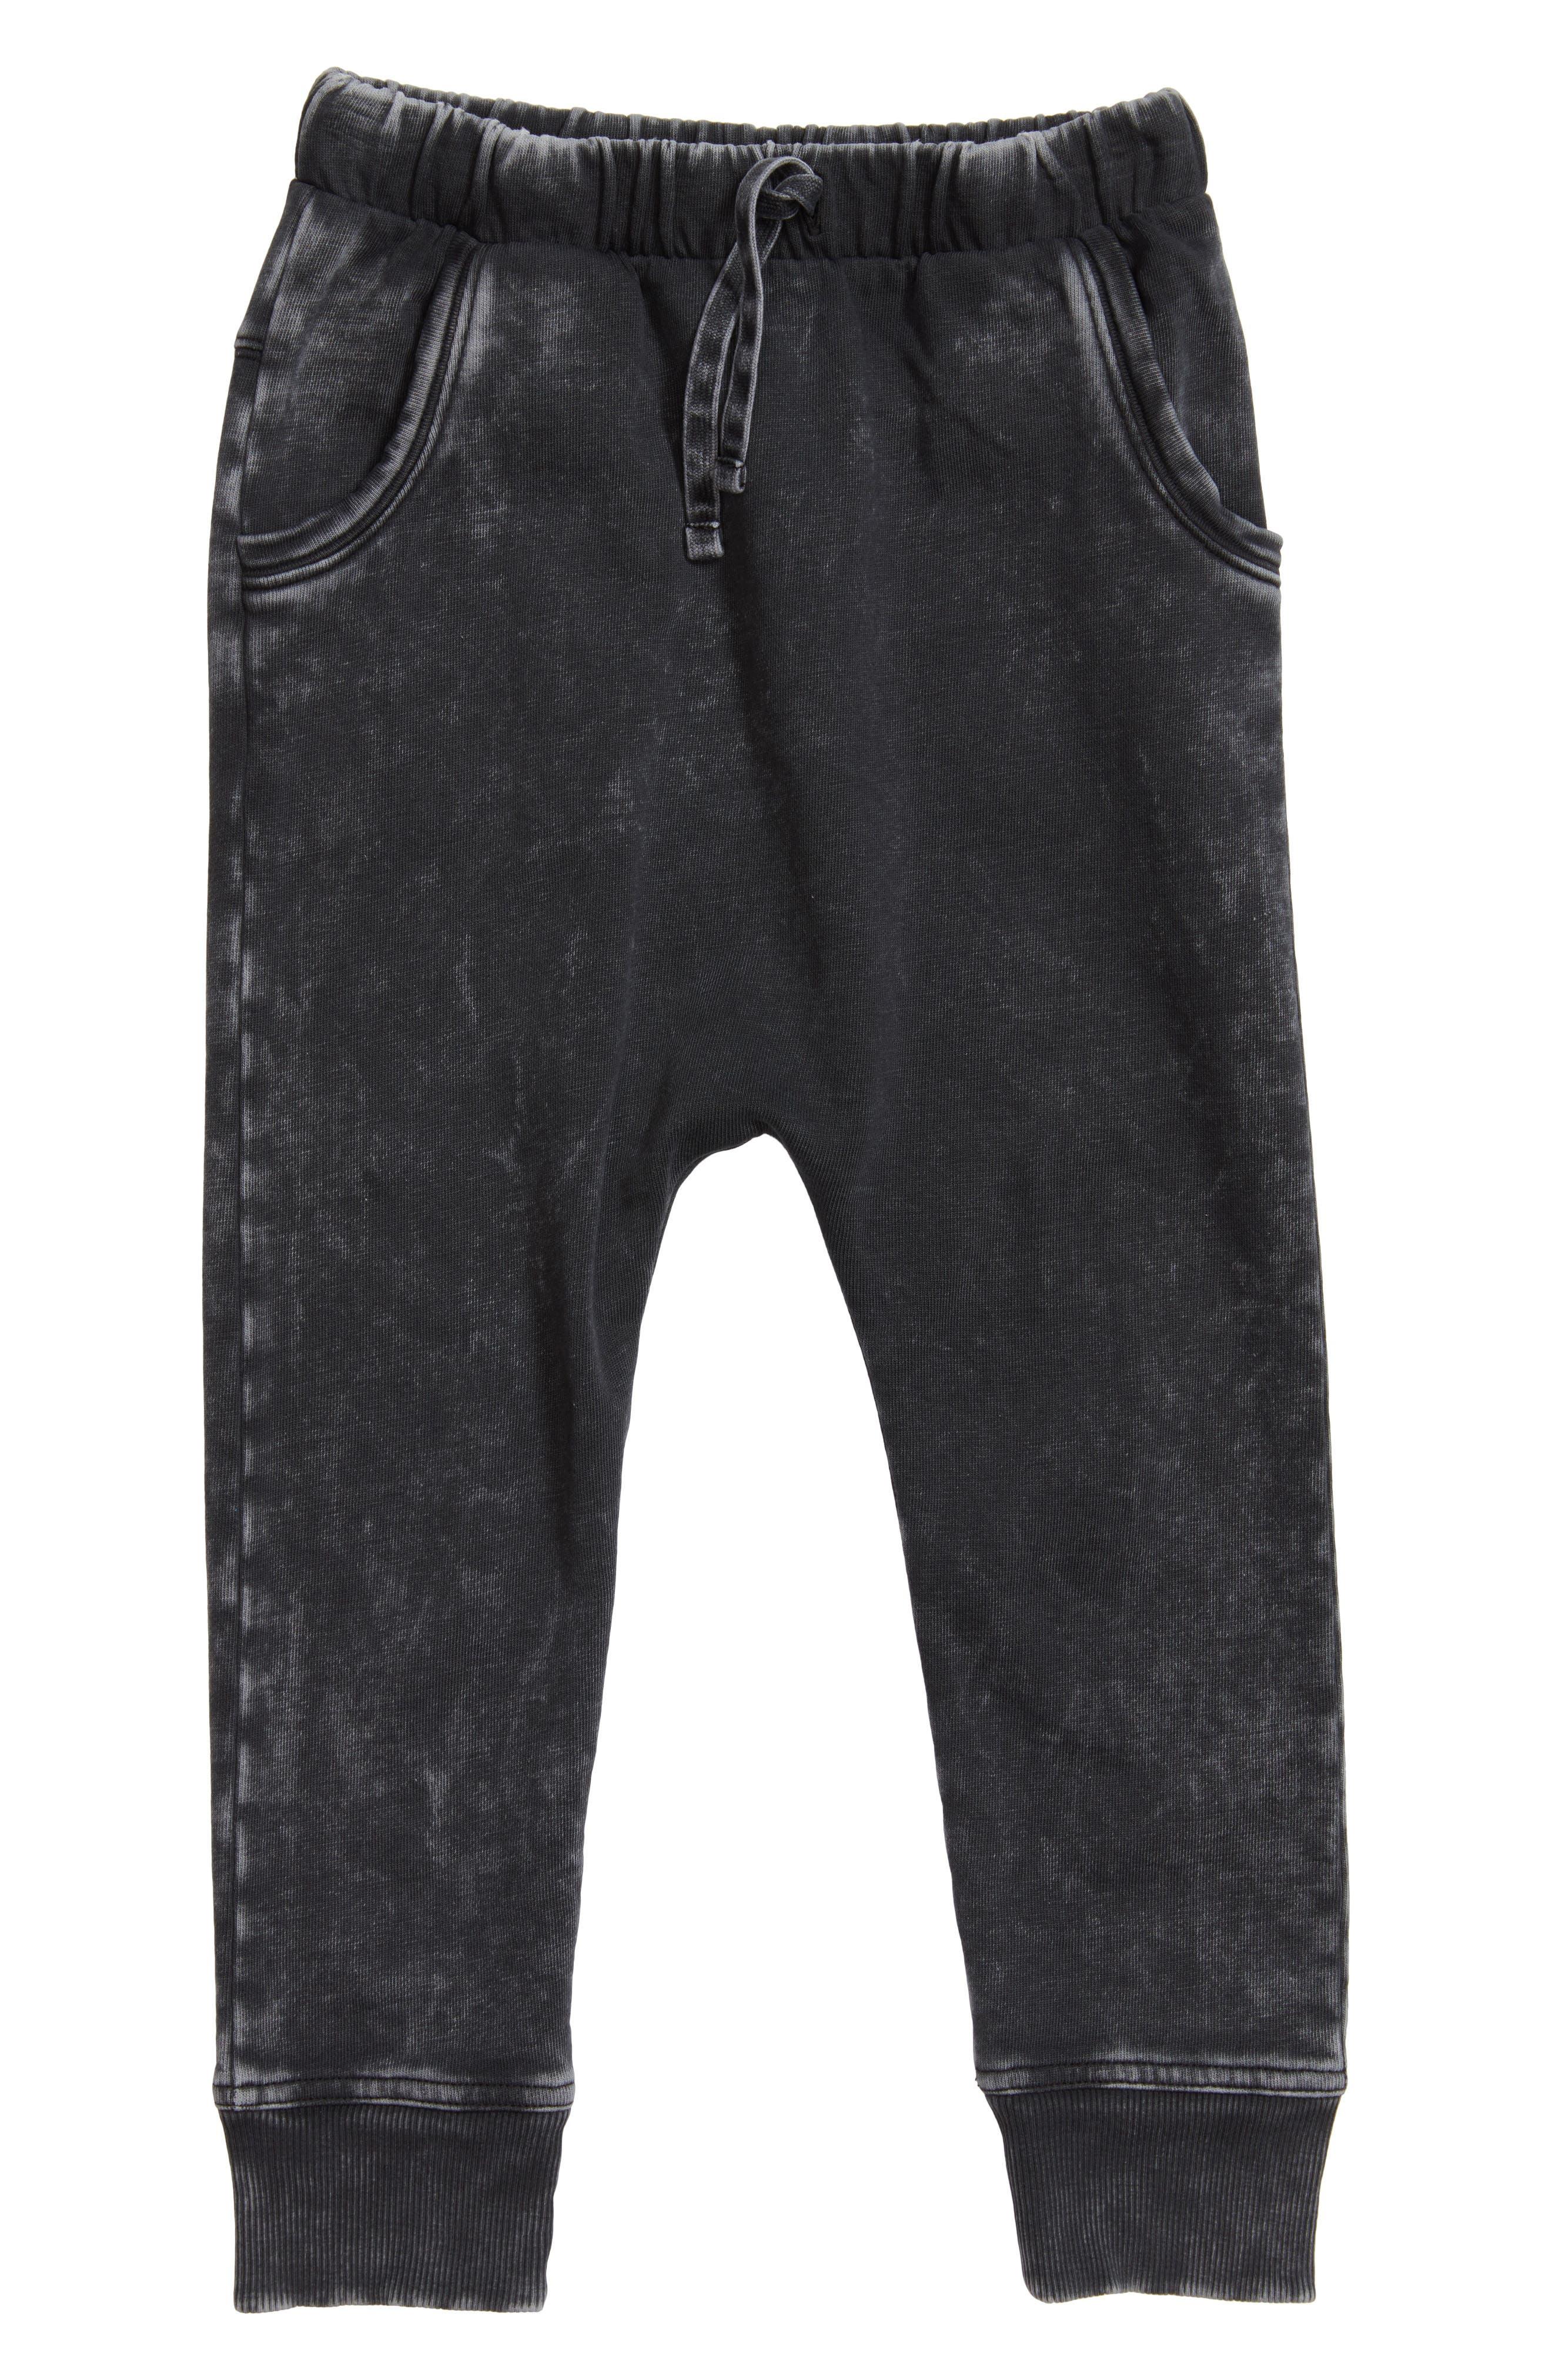 Superwash Sweatpants,                             Main thumbnail 1, color,                             001